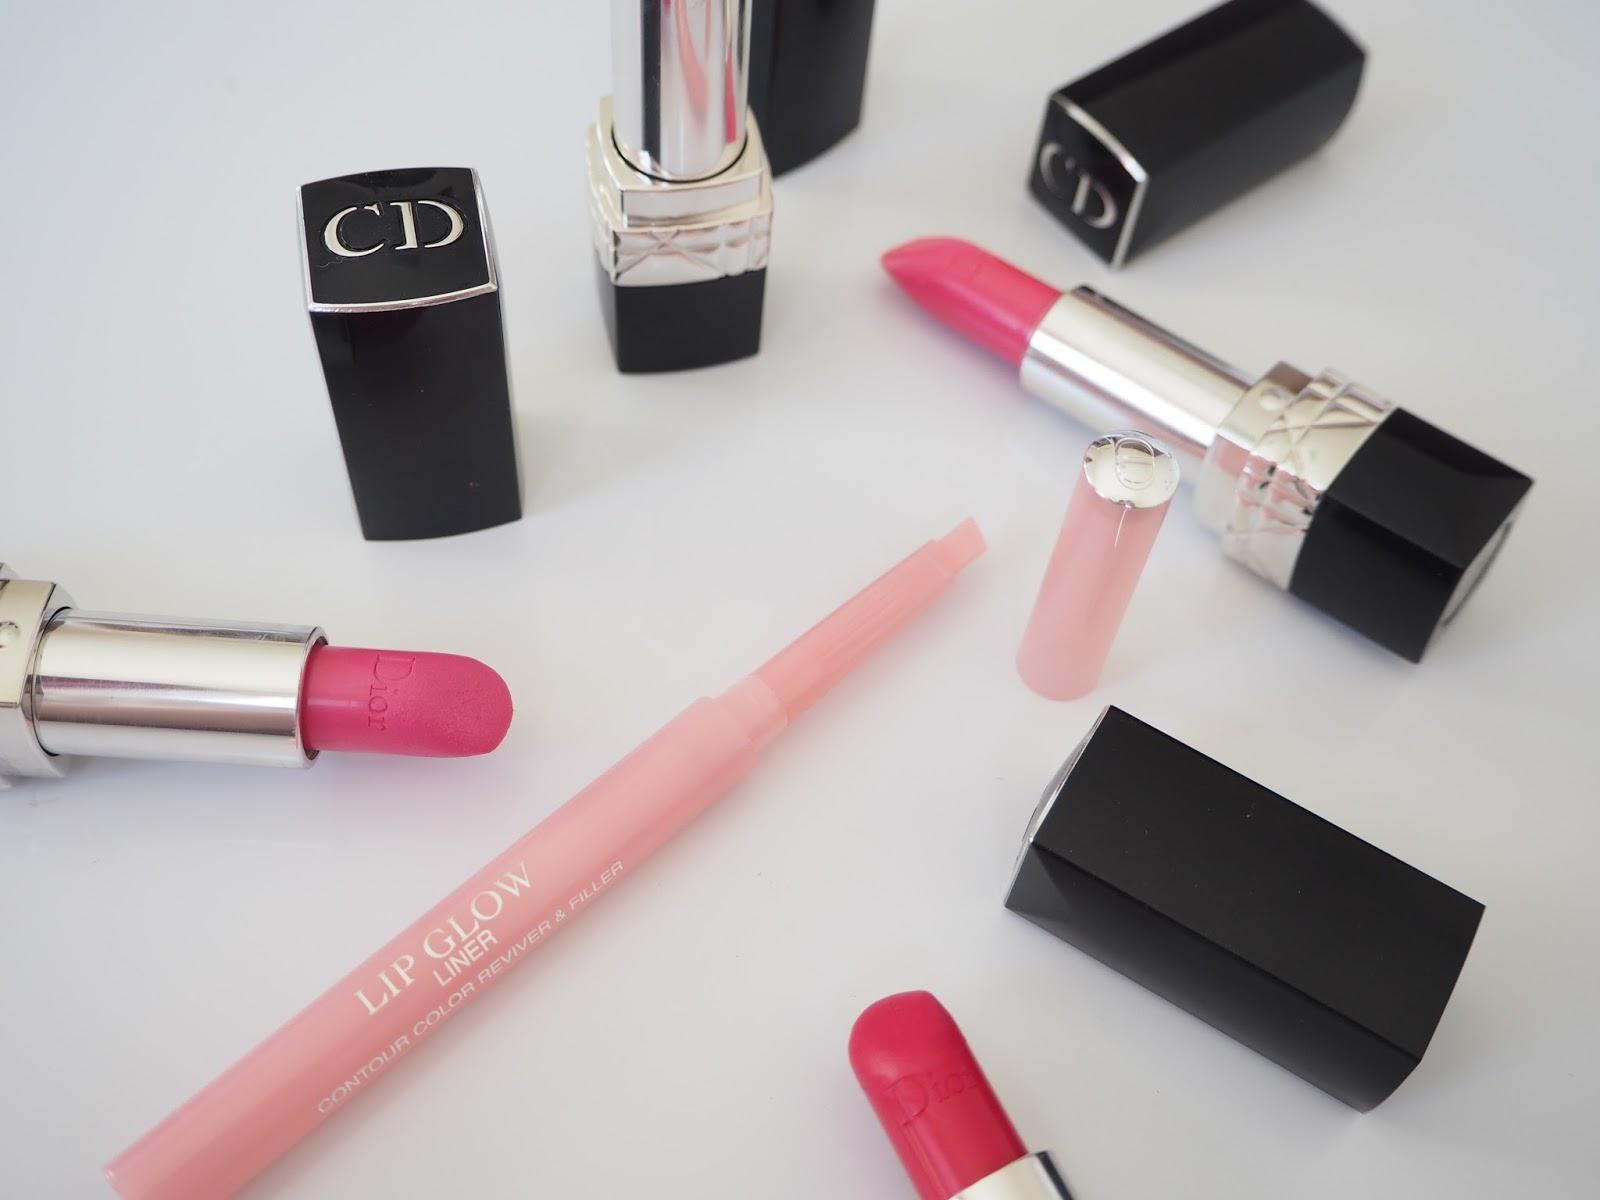 Dior Glow lip liner